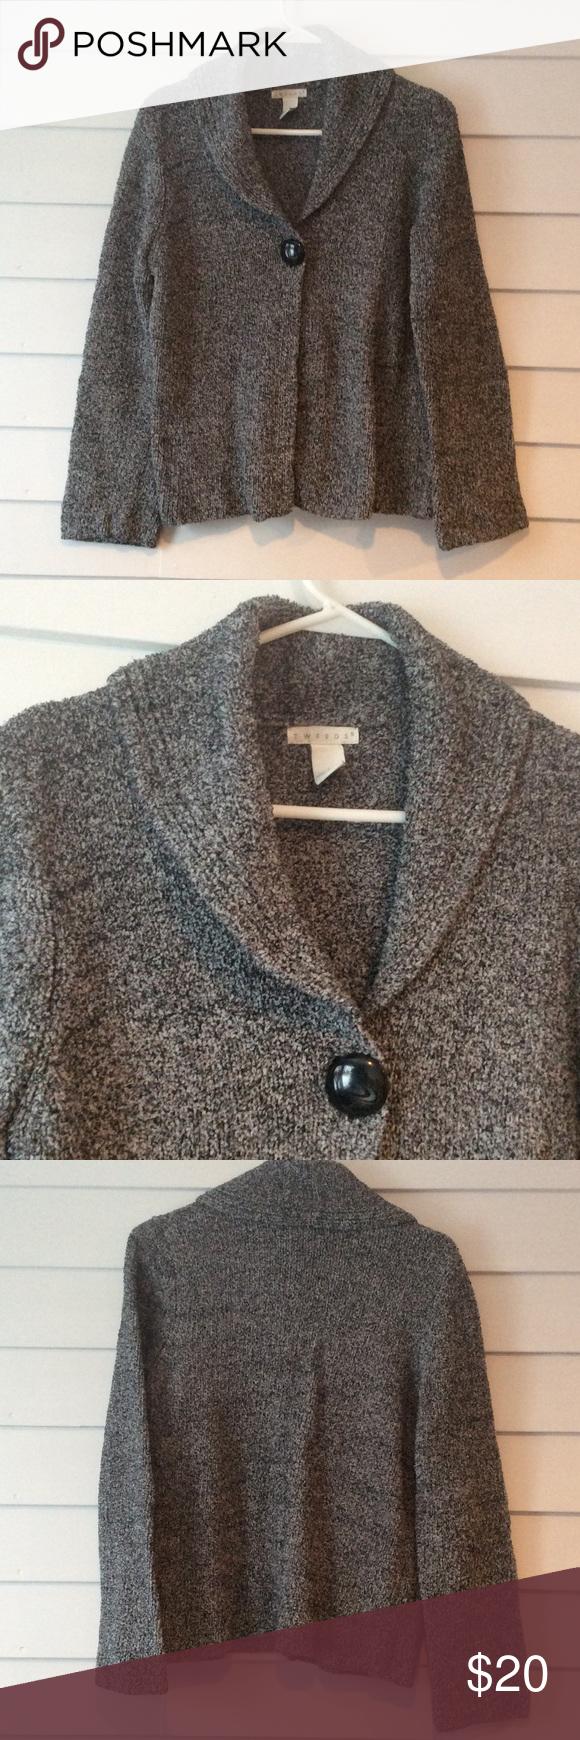 Super Cozy Heavy Gray Fuzzy Sweater Oversized